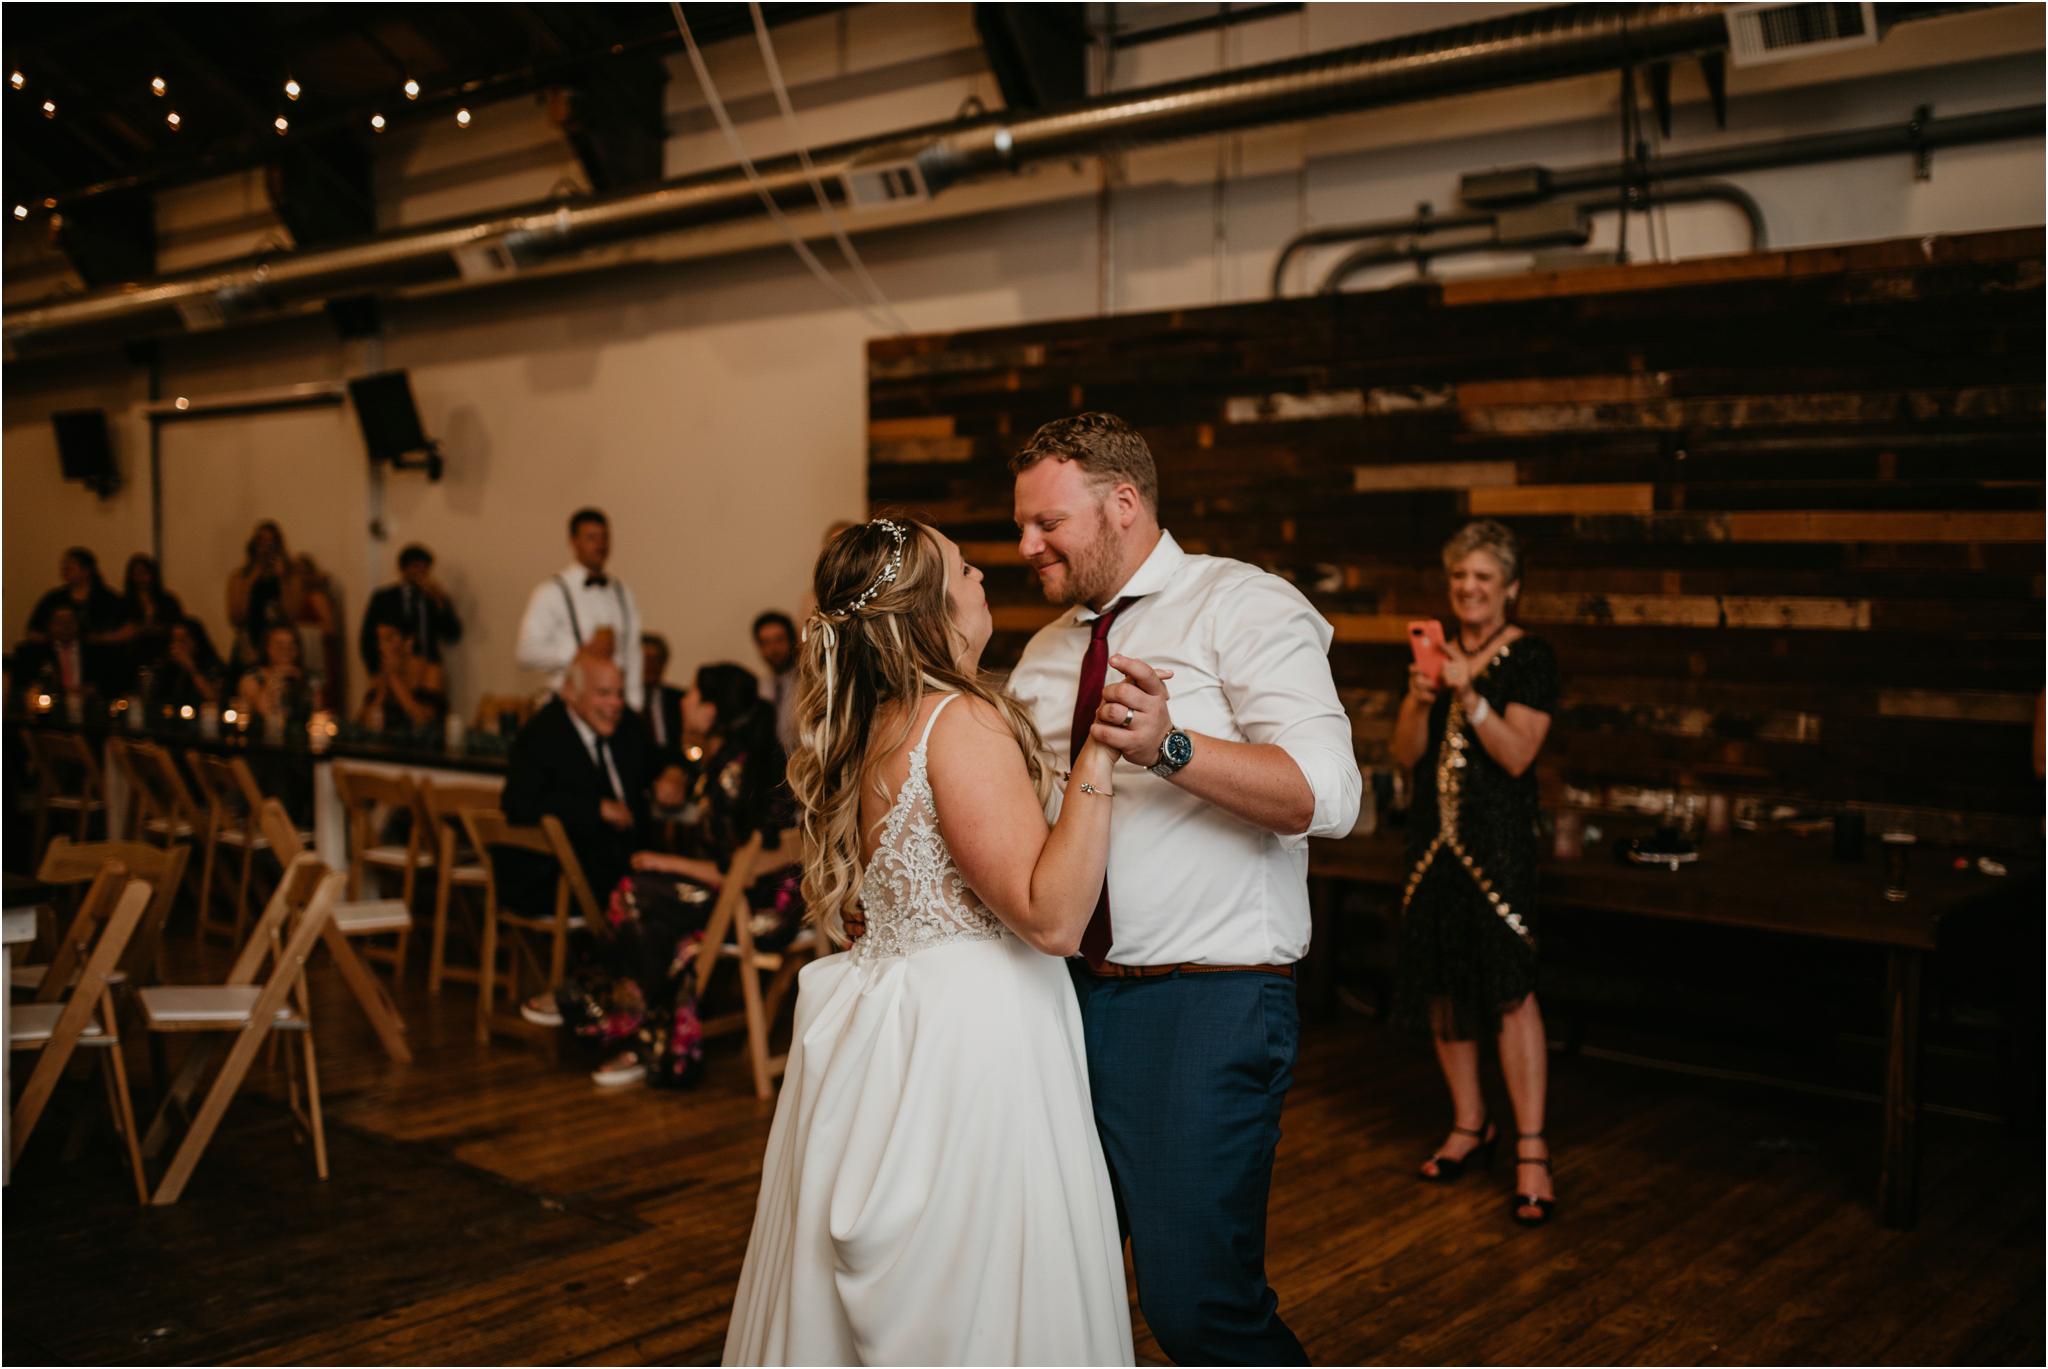 laura-and-matt-metropolist-urban-seattle-wedding-photographer-171.jpg